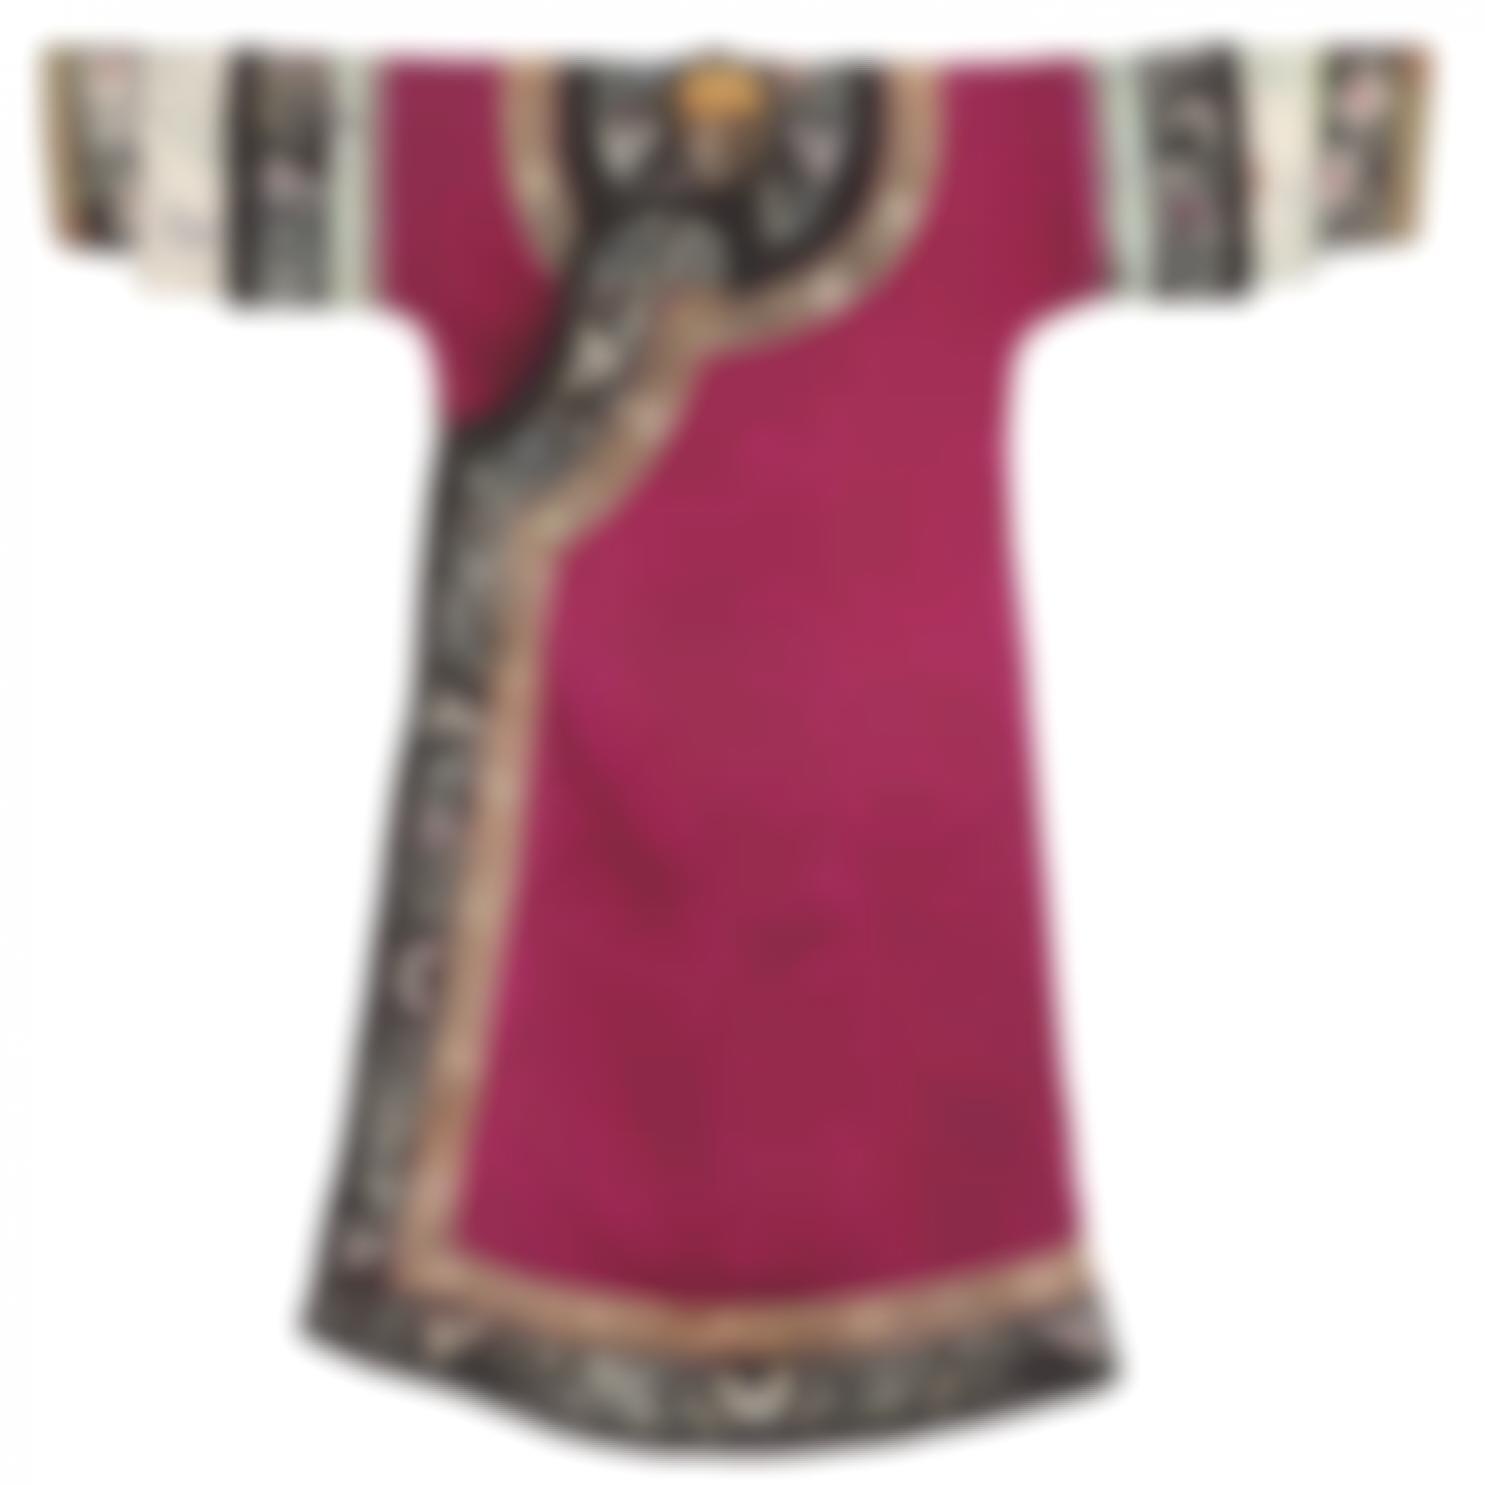 Robe Informelle Bianfu De Type Chenyi-